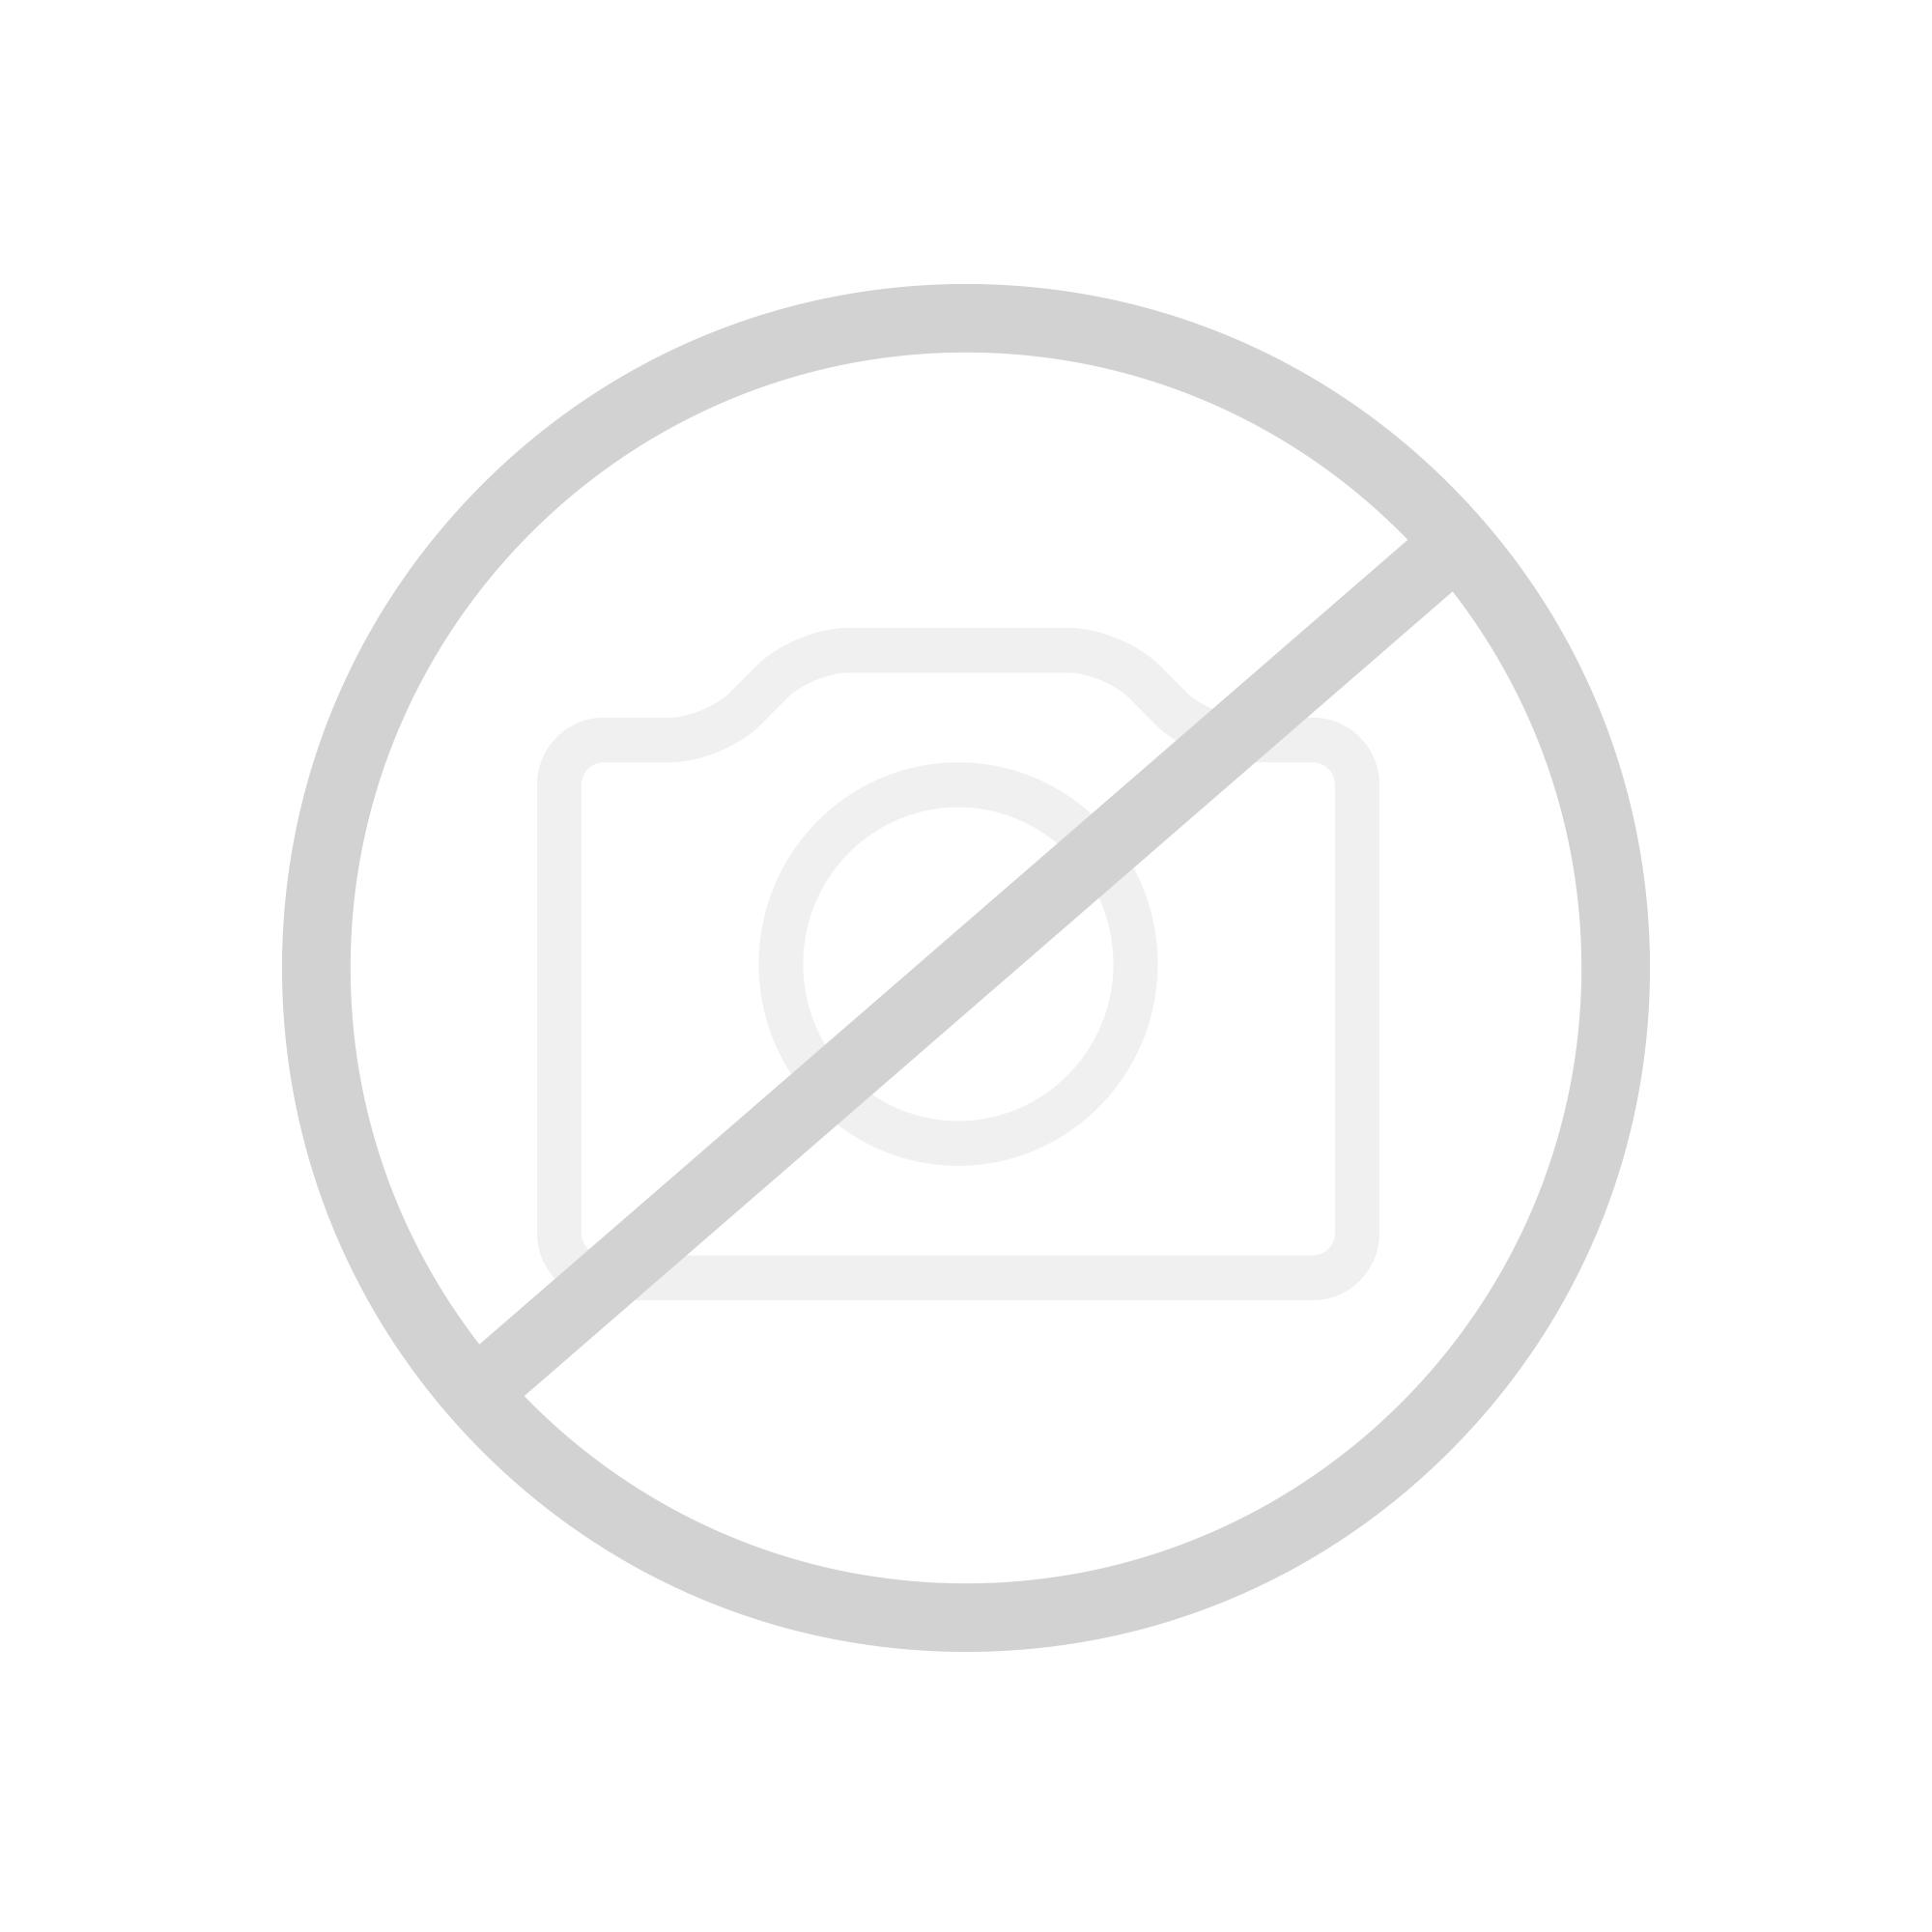 tellkamp cosmic freistehende oval badewanne 0100 087 a cr reuter. Black Bedroom Furniture Sets. Home Design Ideas